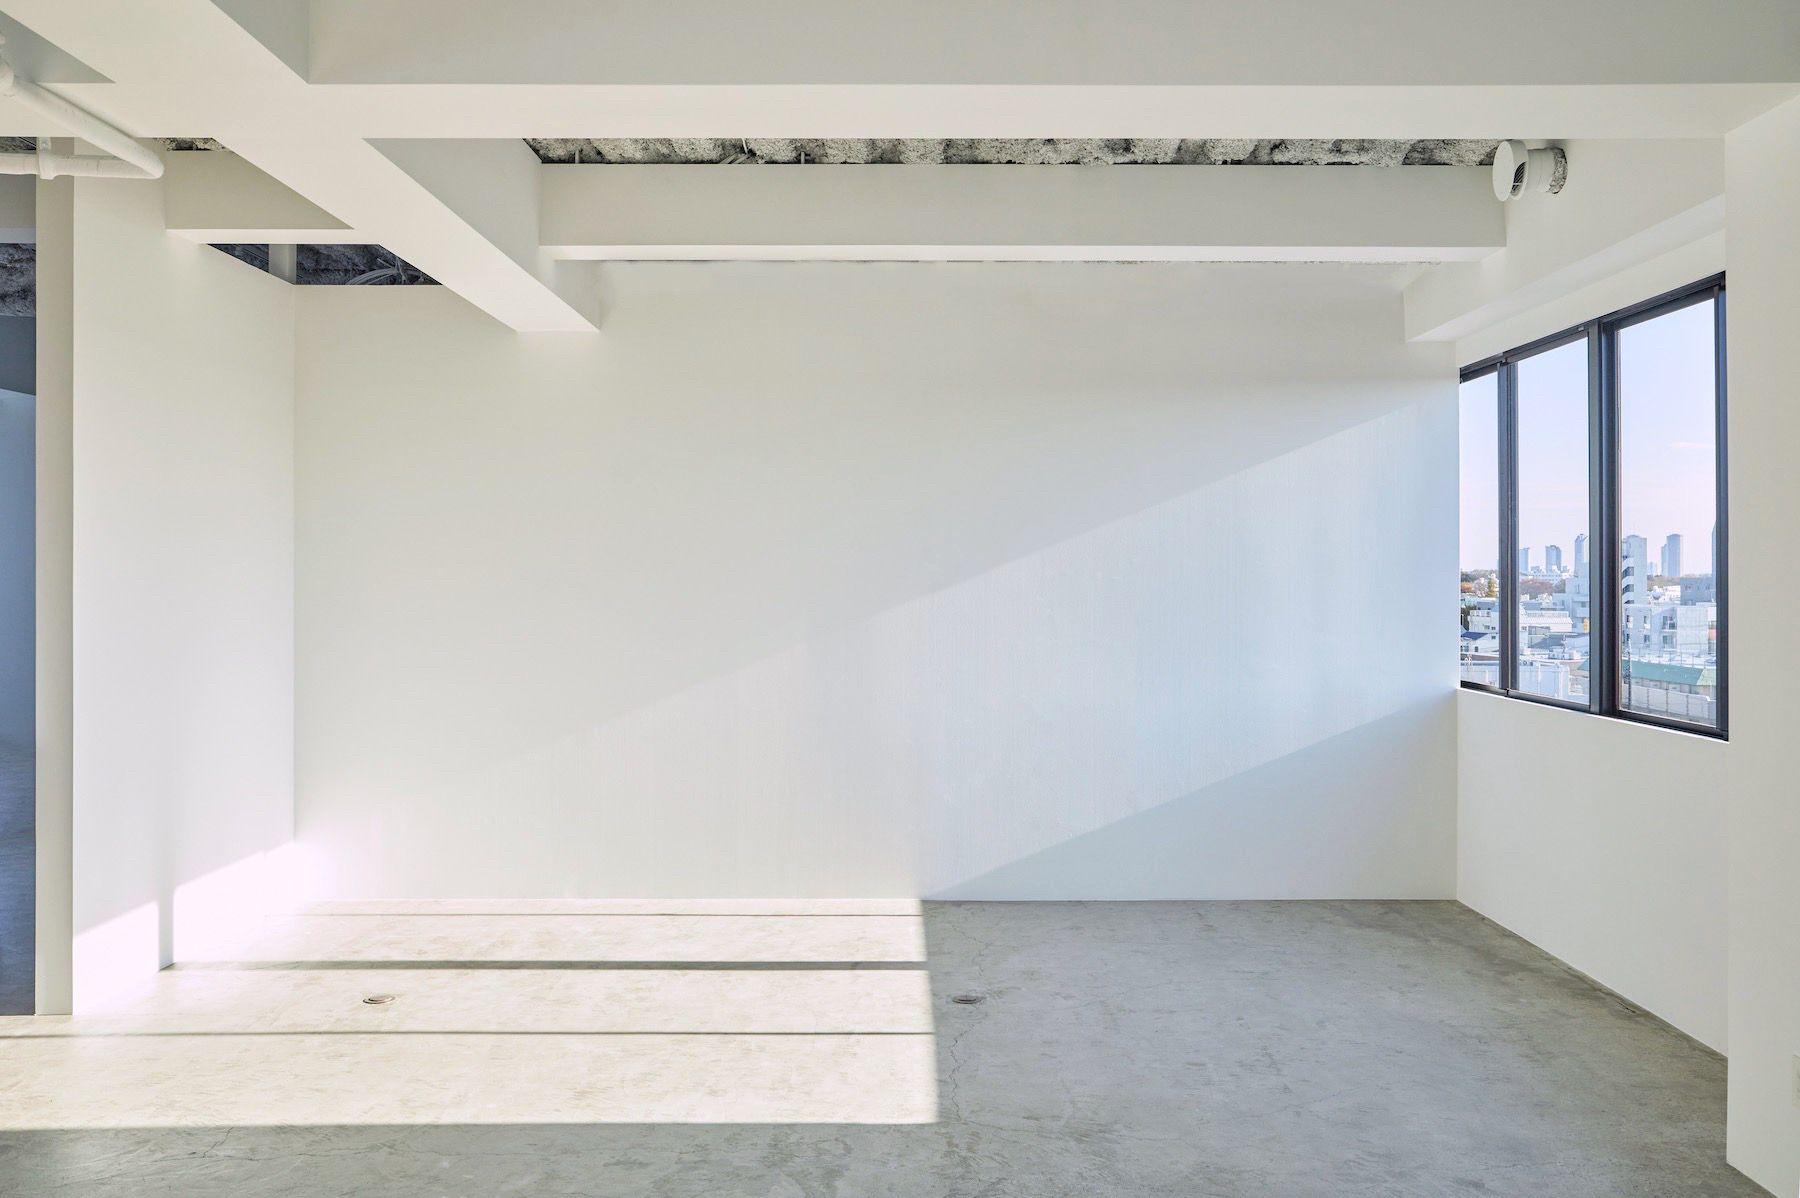 Inspiration studio (インスピレーションスタジオ)午後から夕方までは左の白壁